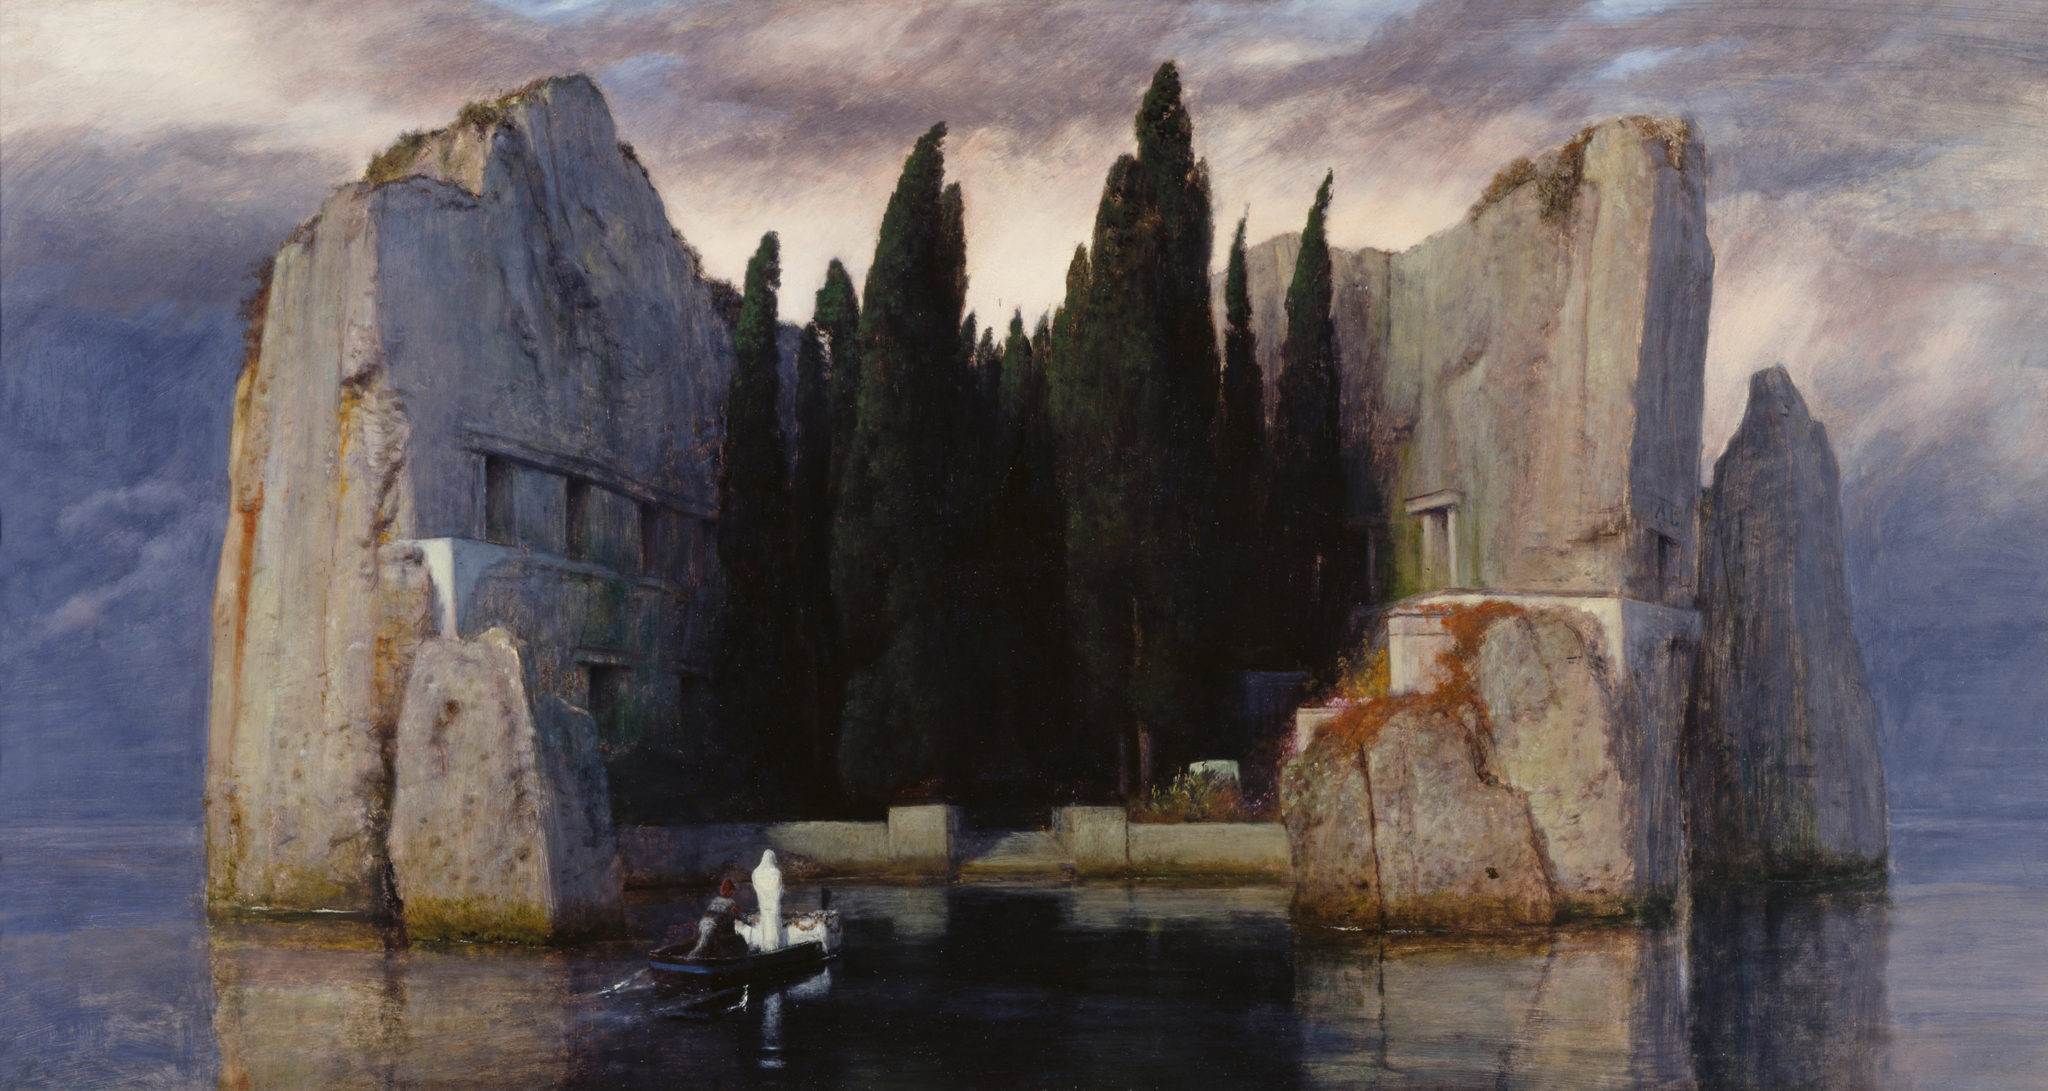 ARTWORK_0_006_Arnold Böcklin_Die Toteninsel III